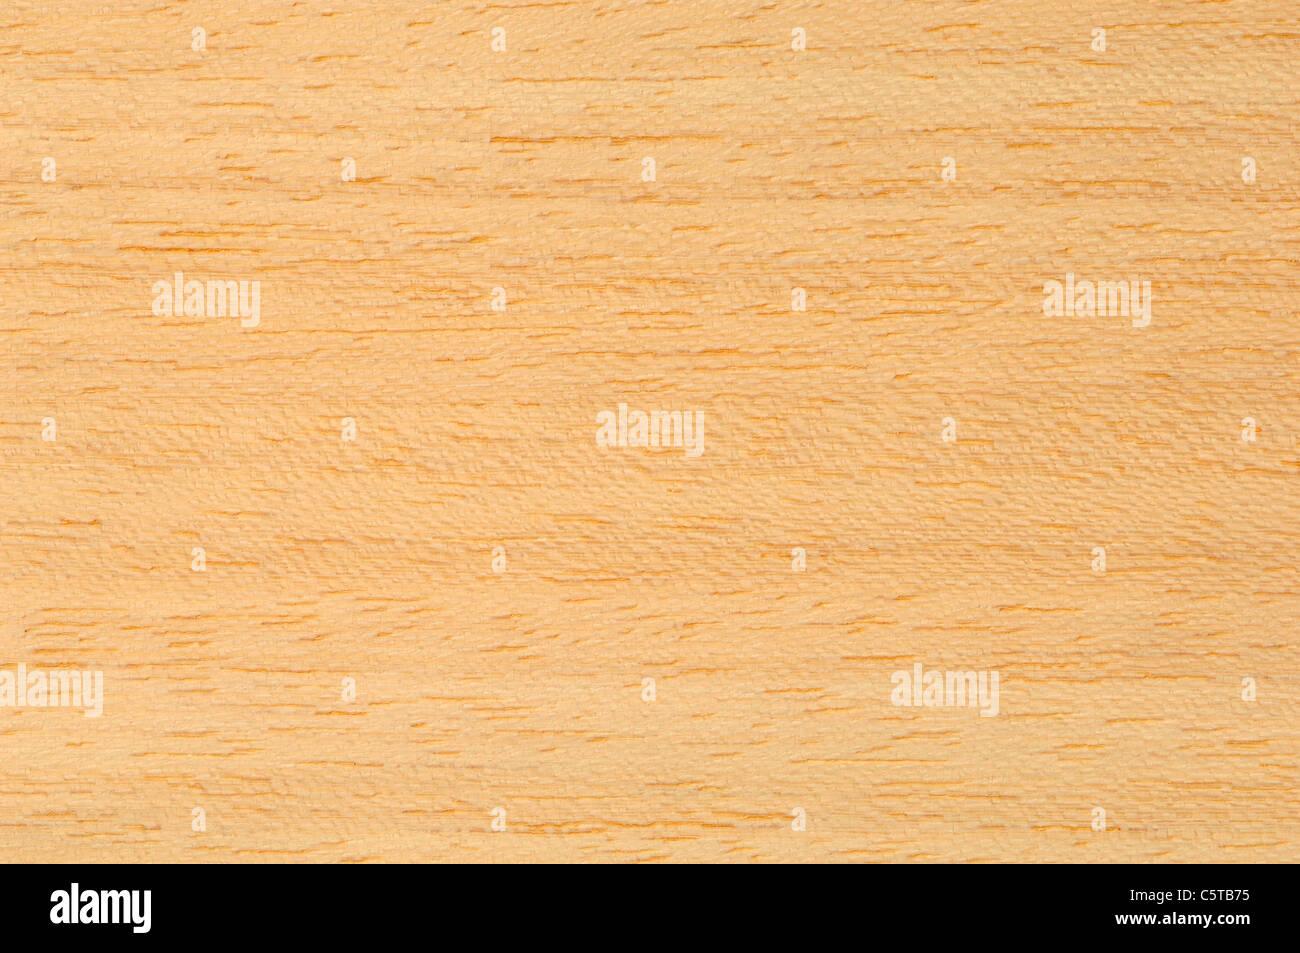 Wood surface, Koto Wood (Pterygota macrocarpa), full frame - Stock Image